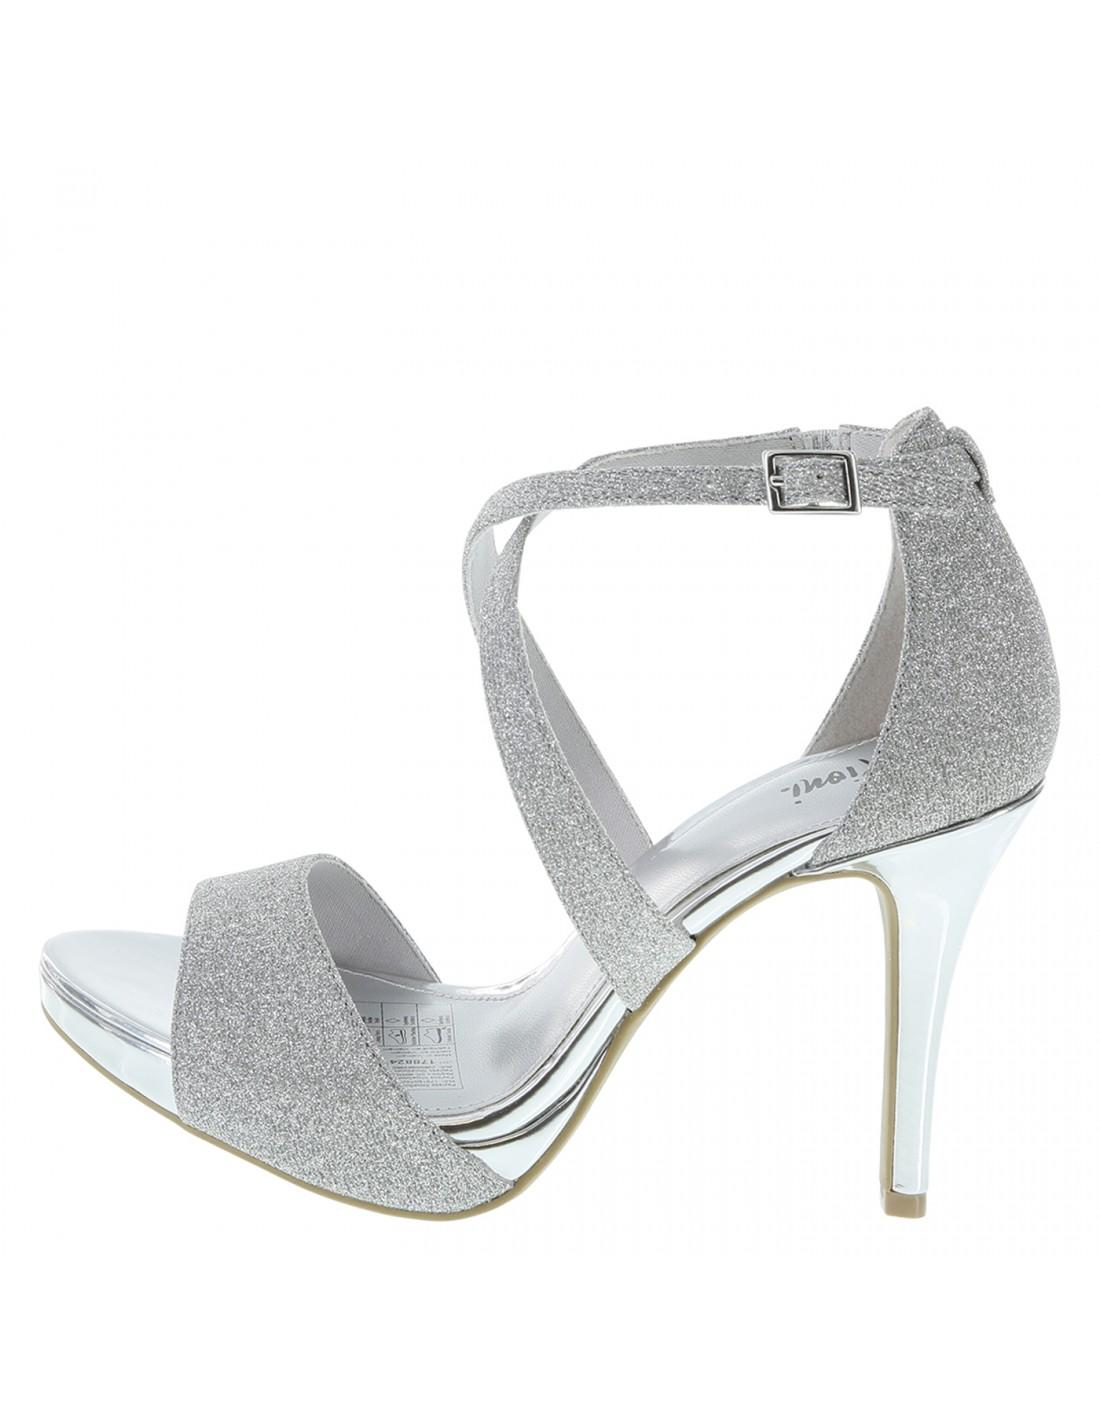 f39a9cb374e3 Women s Halle Sandals - Silver. On sale! Previous